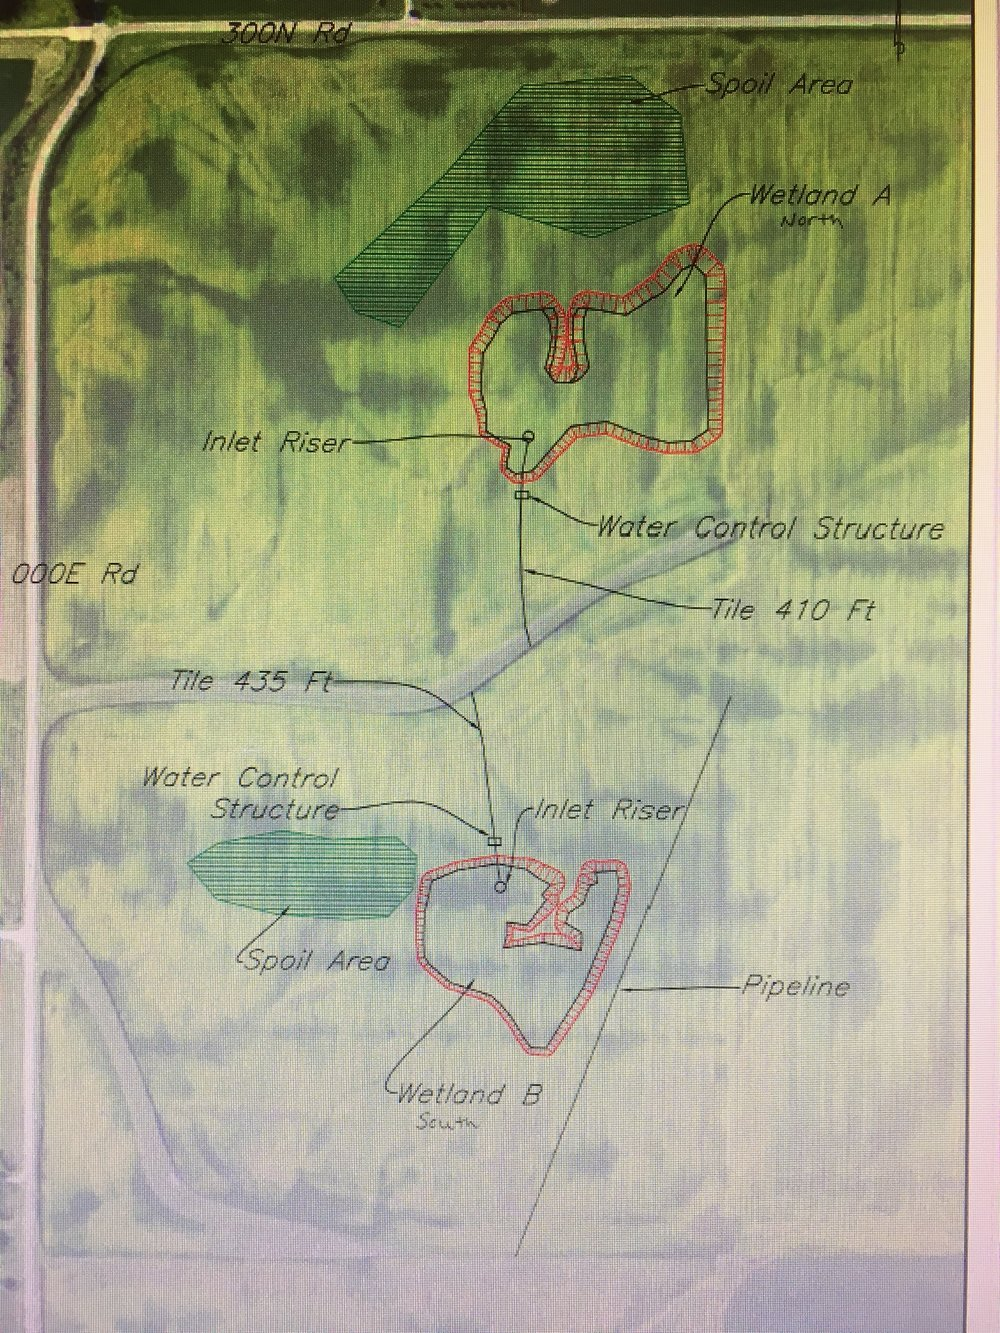 Wetland Restoration Plans.